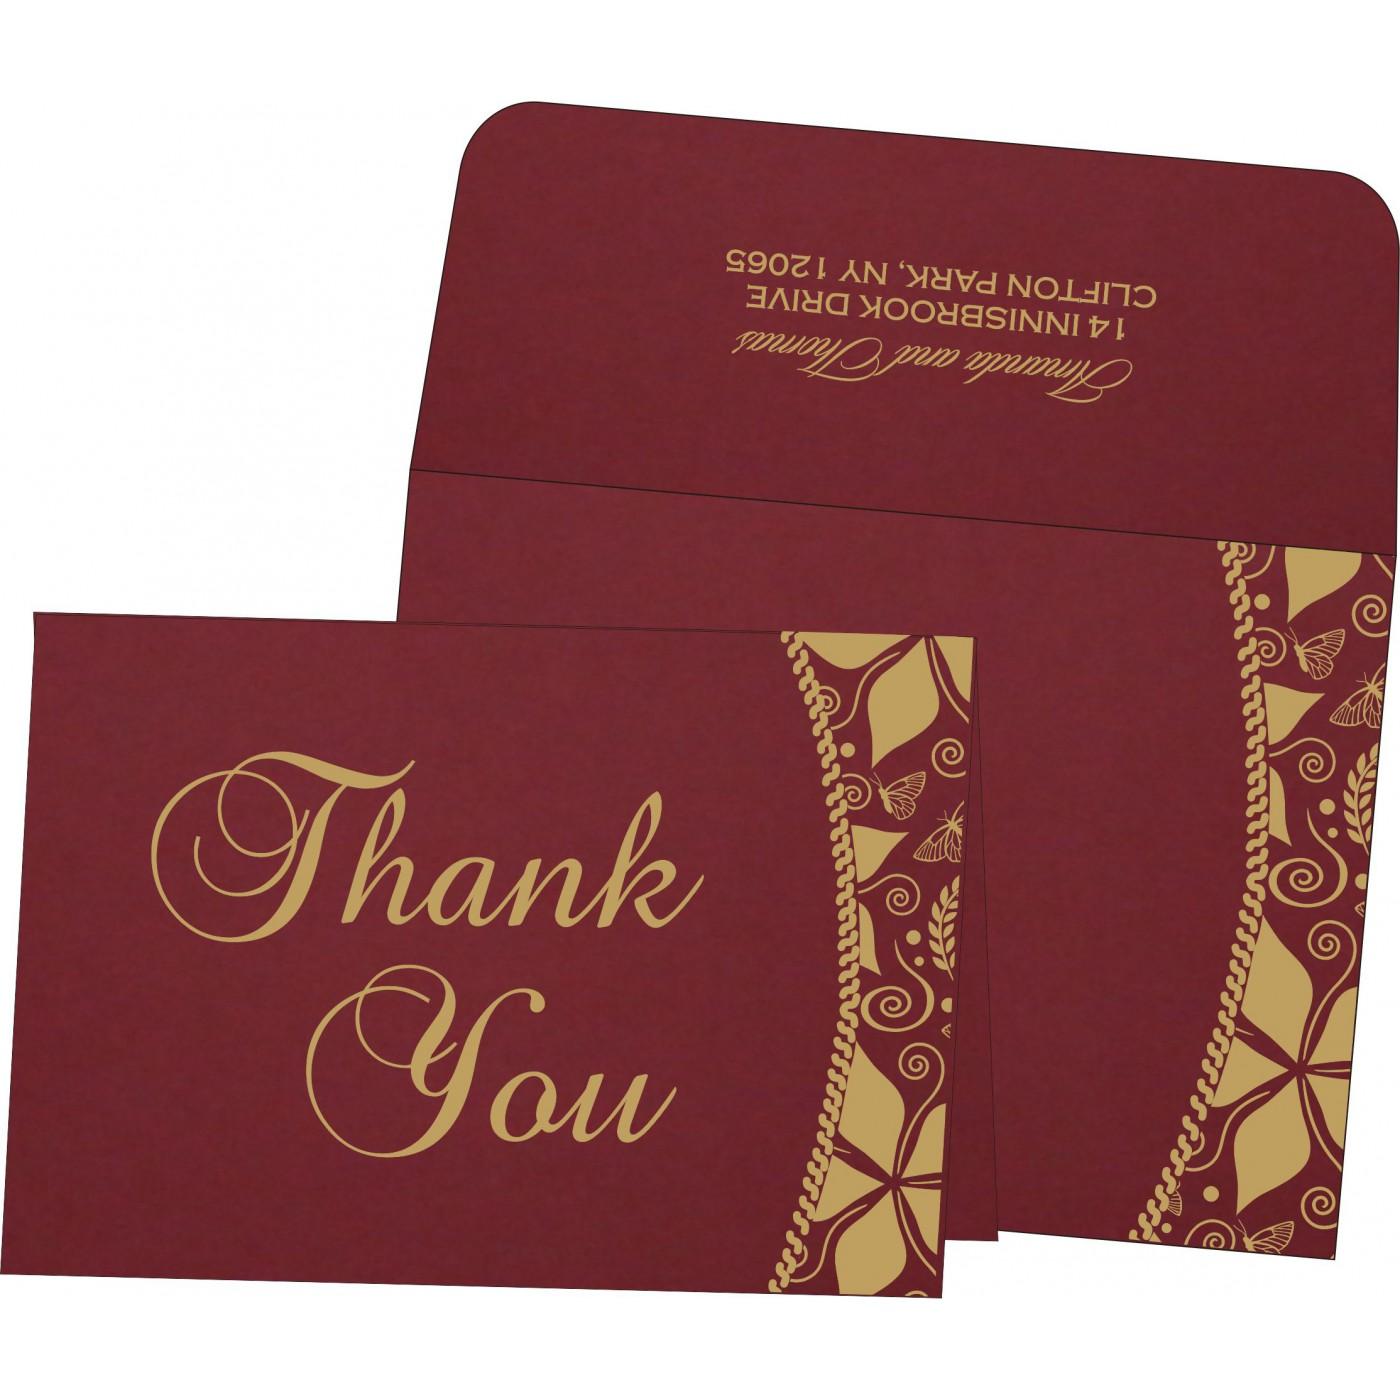 Thank You Cards : TYC-1169 - 123WeddingCards